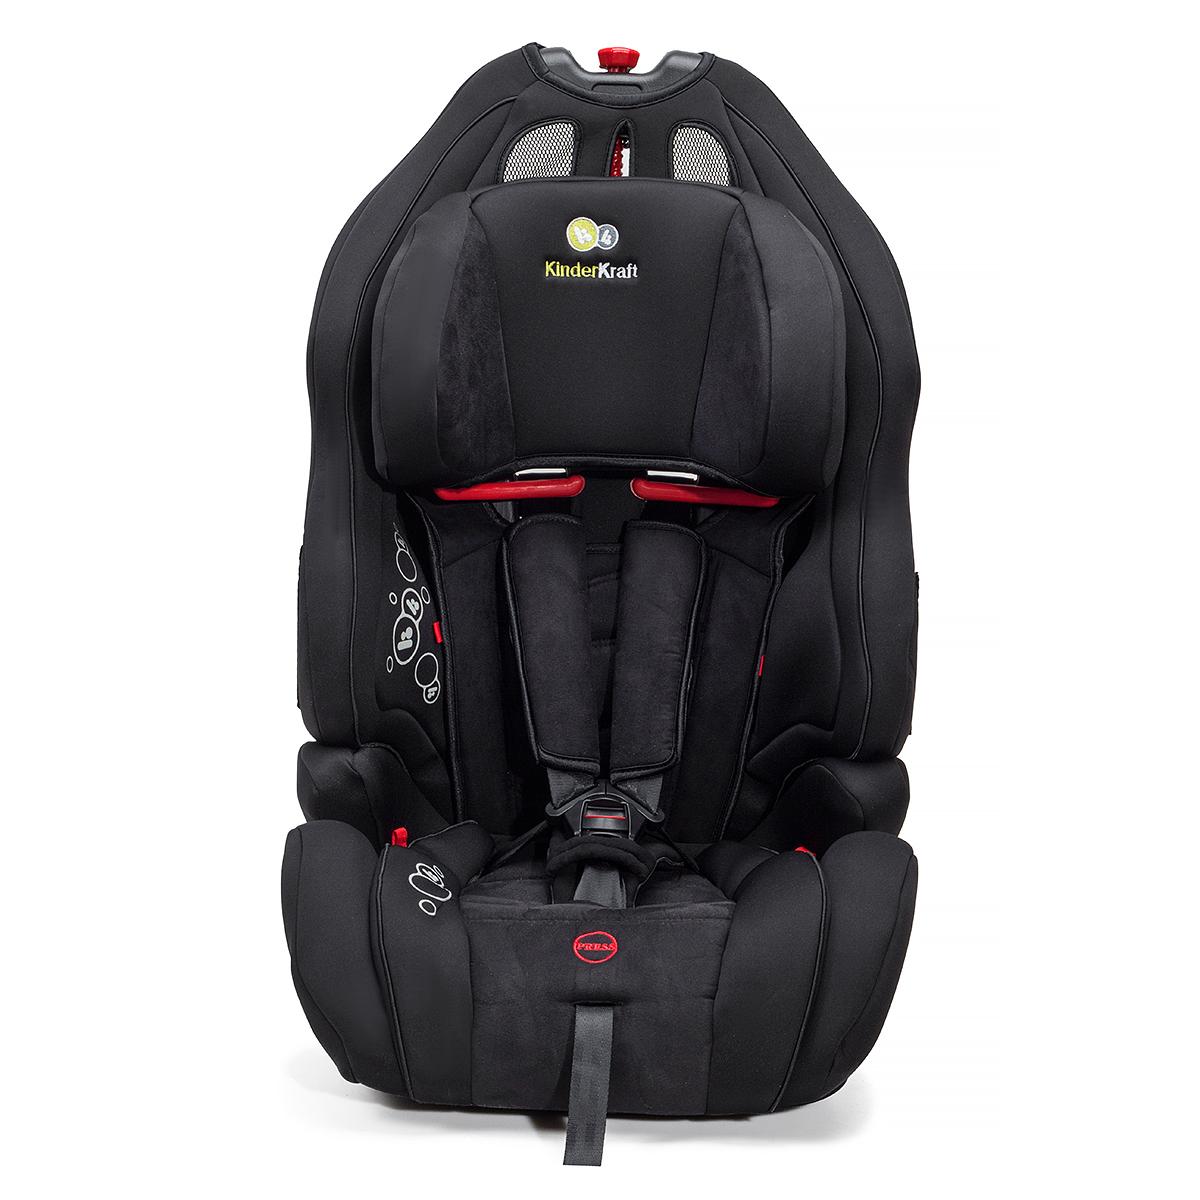 kinderautositz autositz kindersitz kinderkraft smart up schwarz 9 36 gruppe 123 ebay. Black Bedroom Furniture Sets. Home Design Ideas